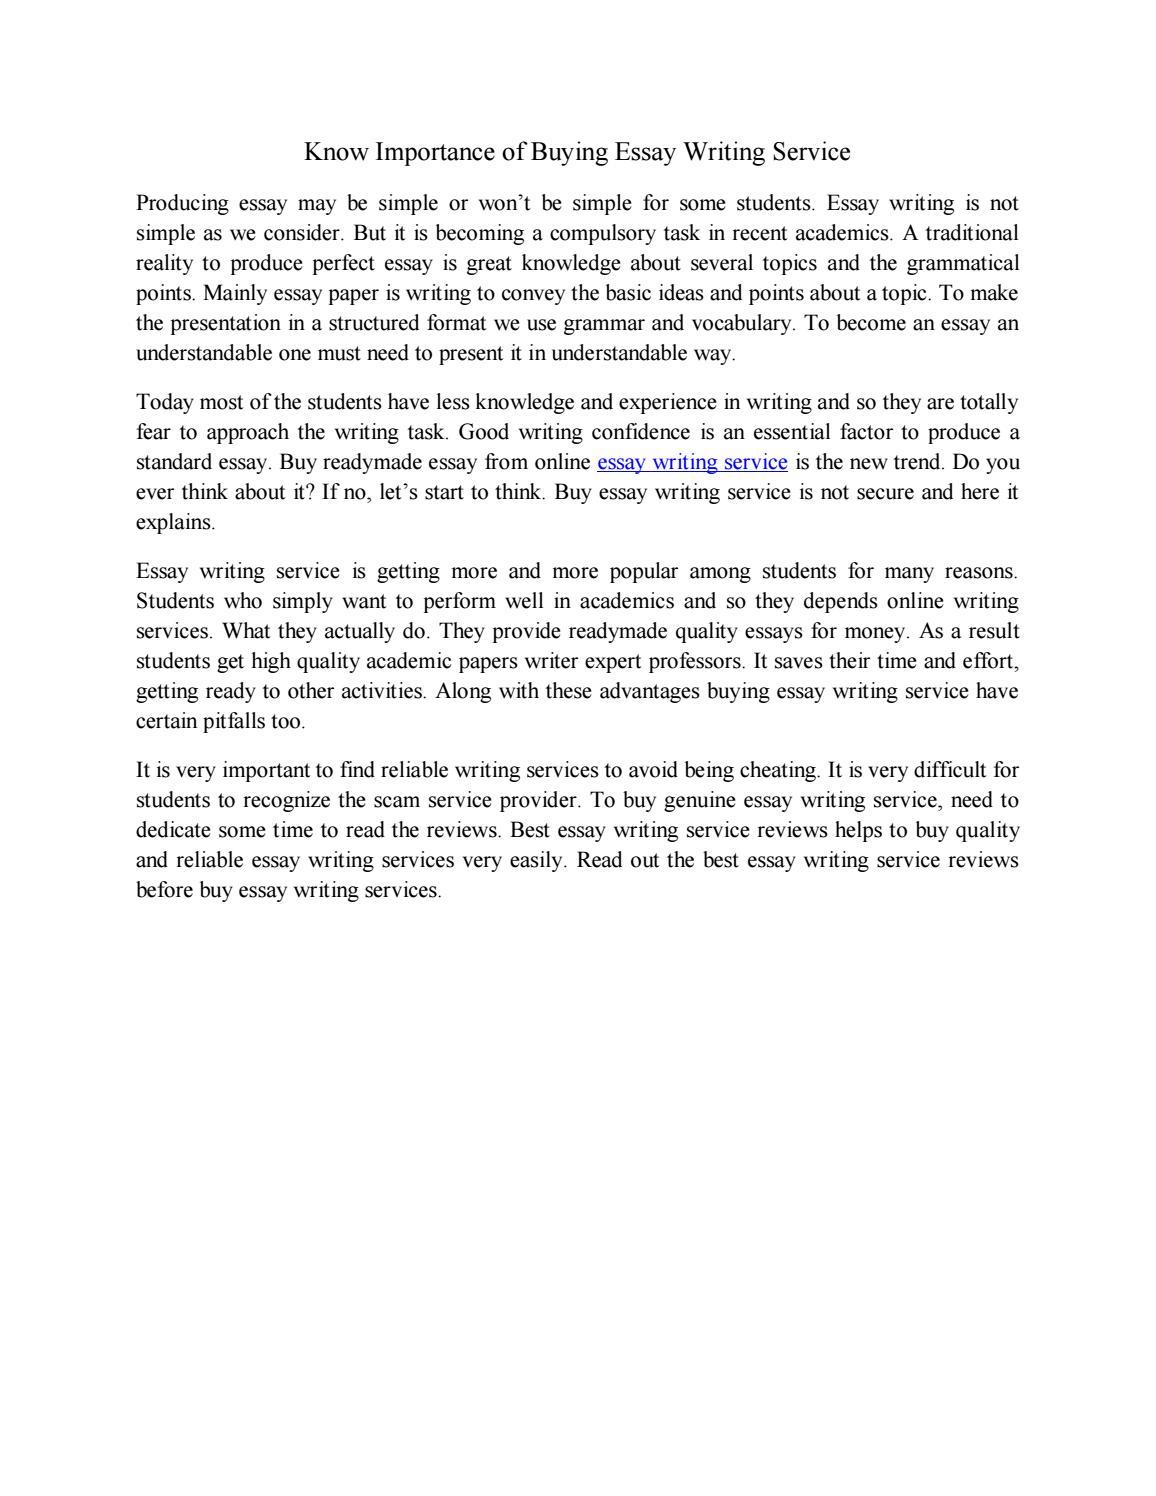 Buy law essay uk